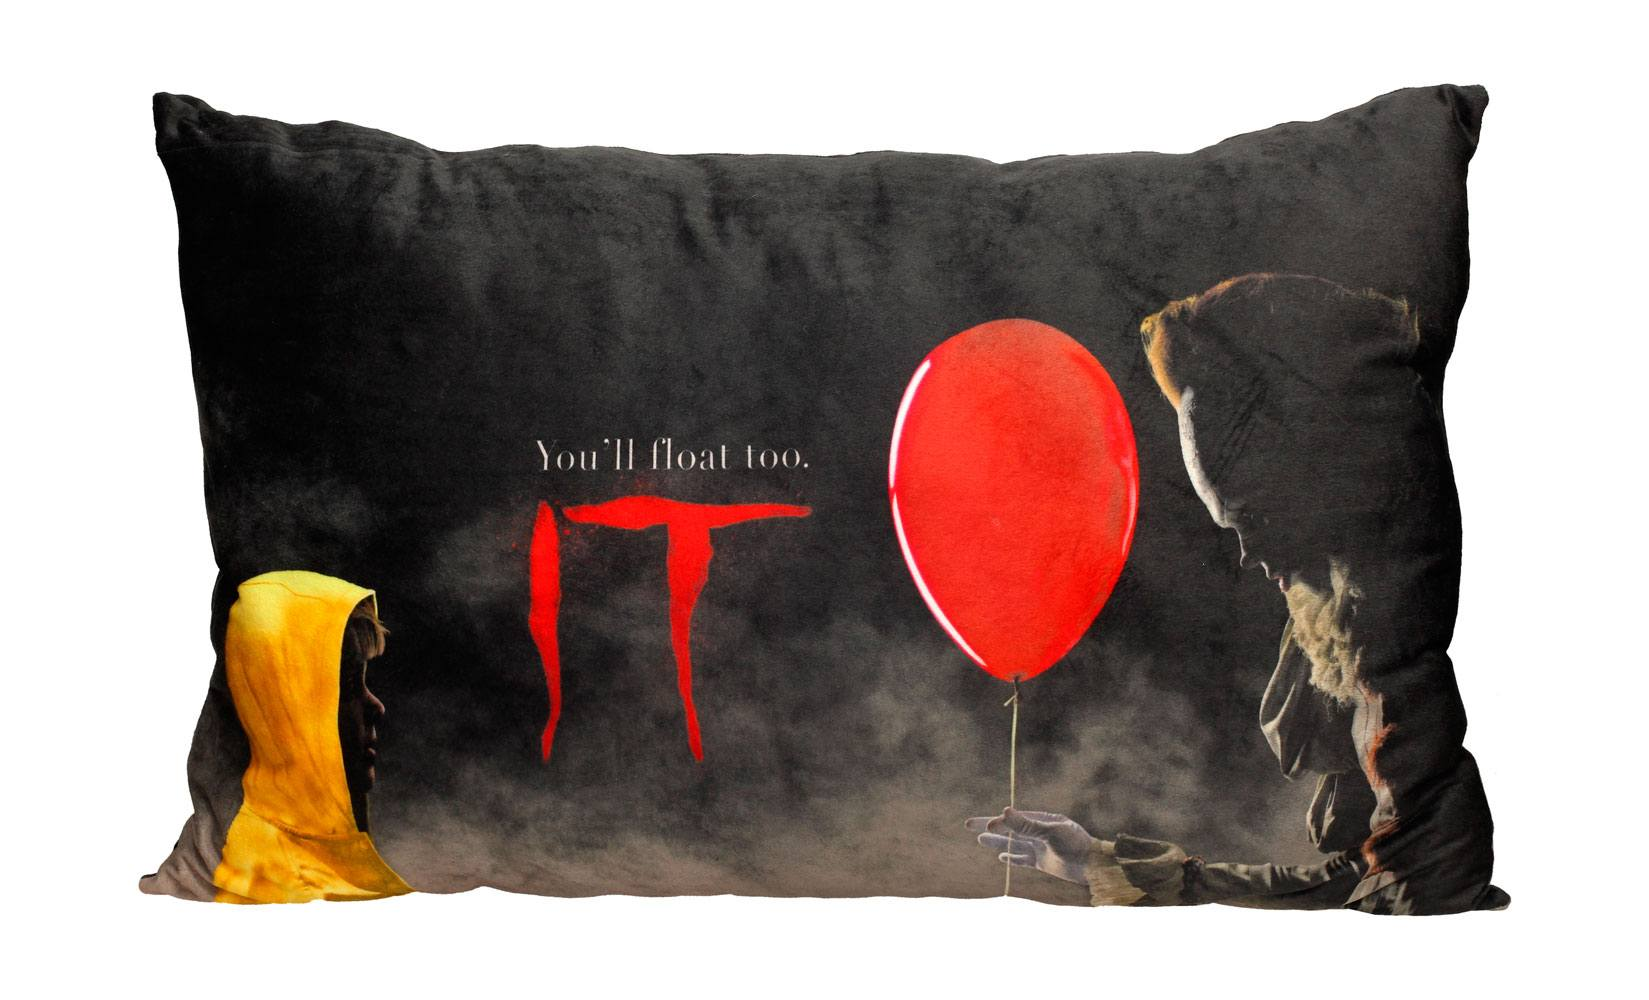 Stephen Kings It 2017 Cushion You'll Float Too 55 x 35 cm